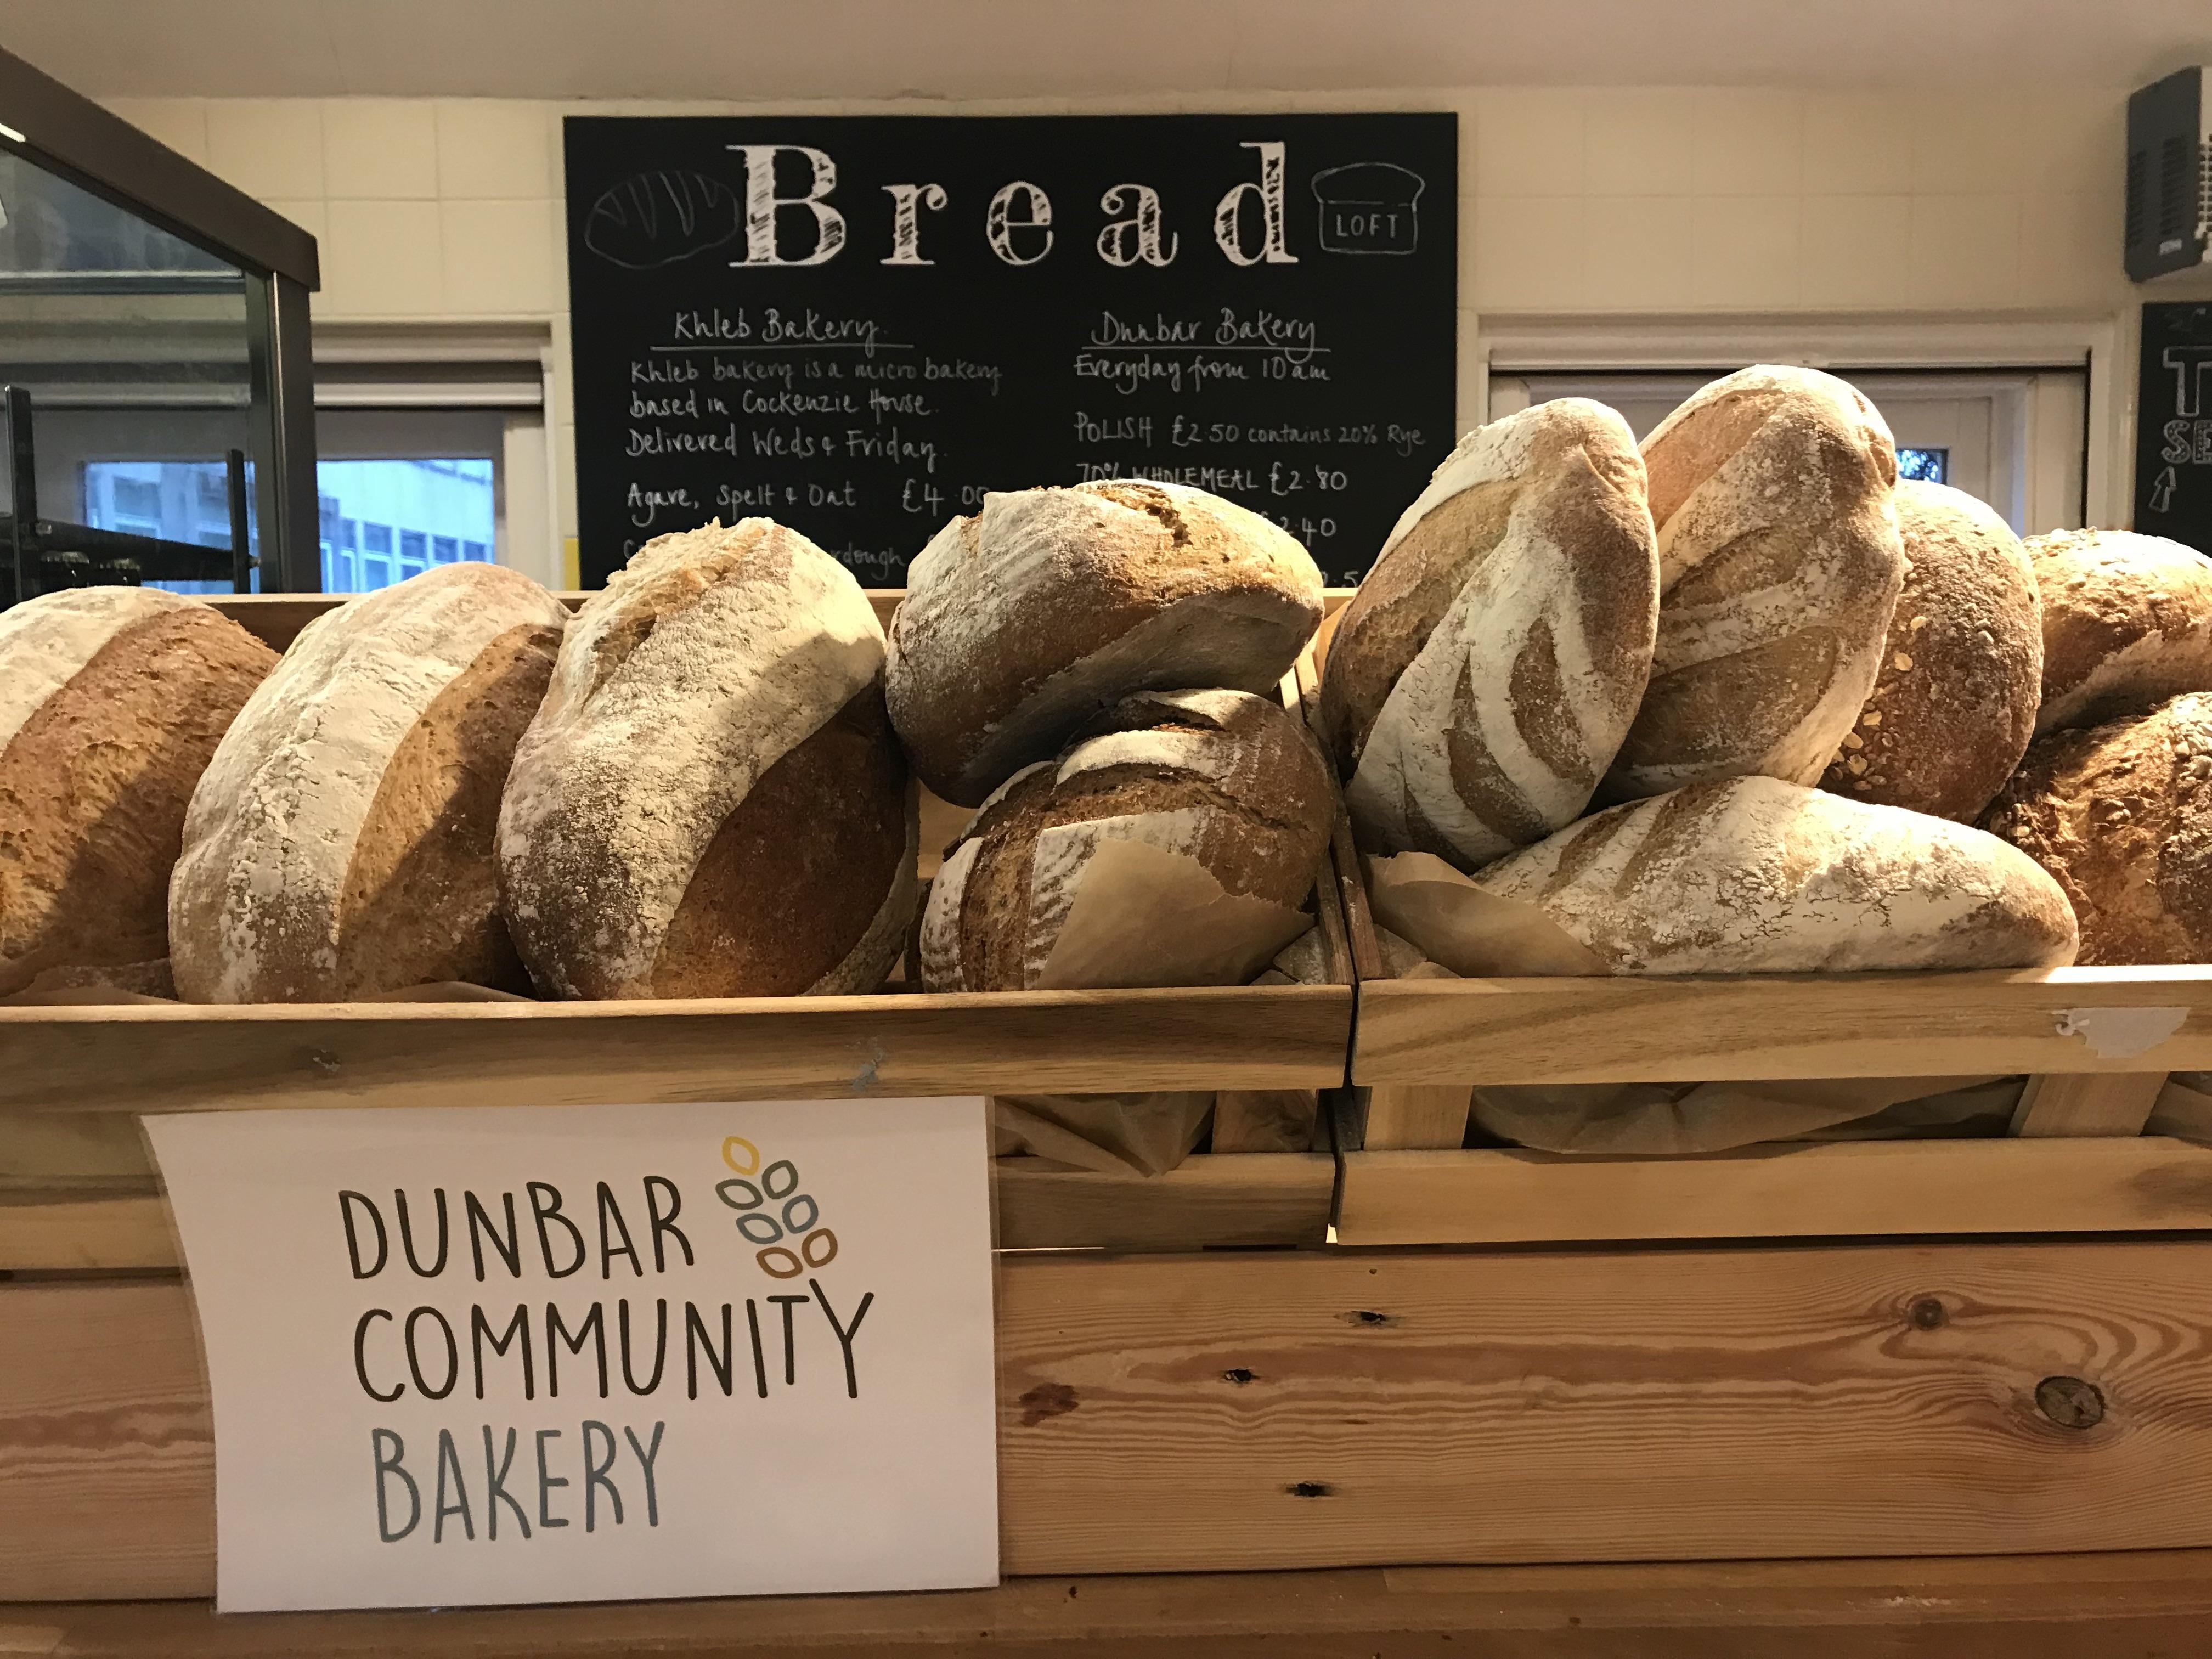 Dunbar Bakery Bread